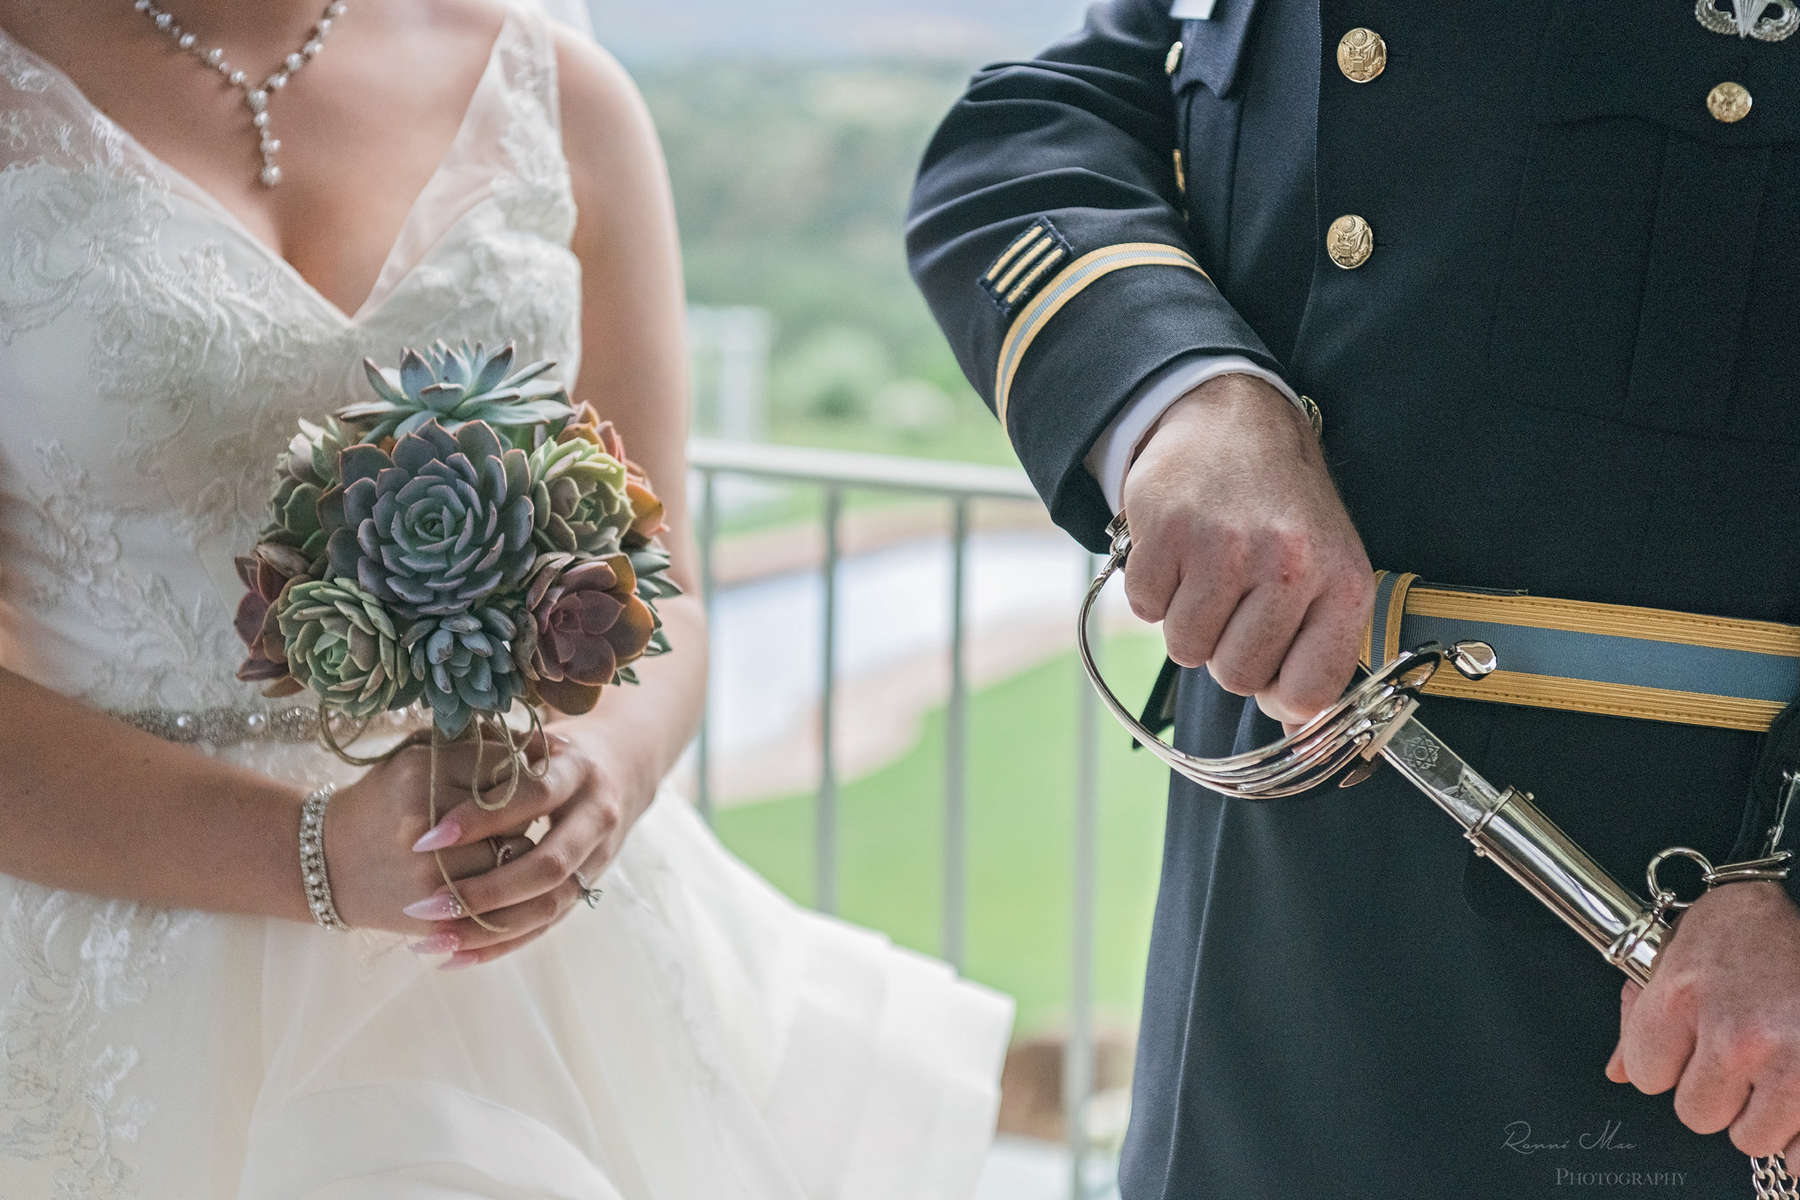 WeddingSample_Lindeman_14